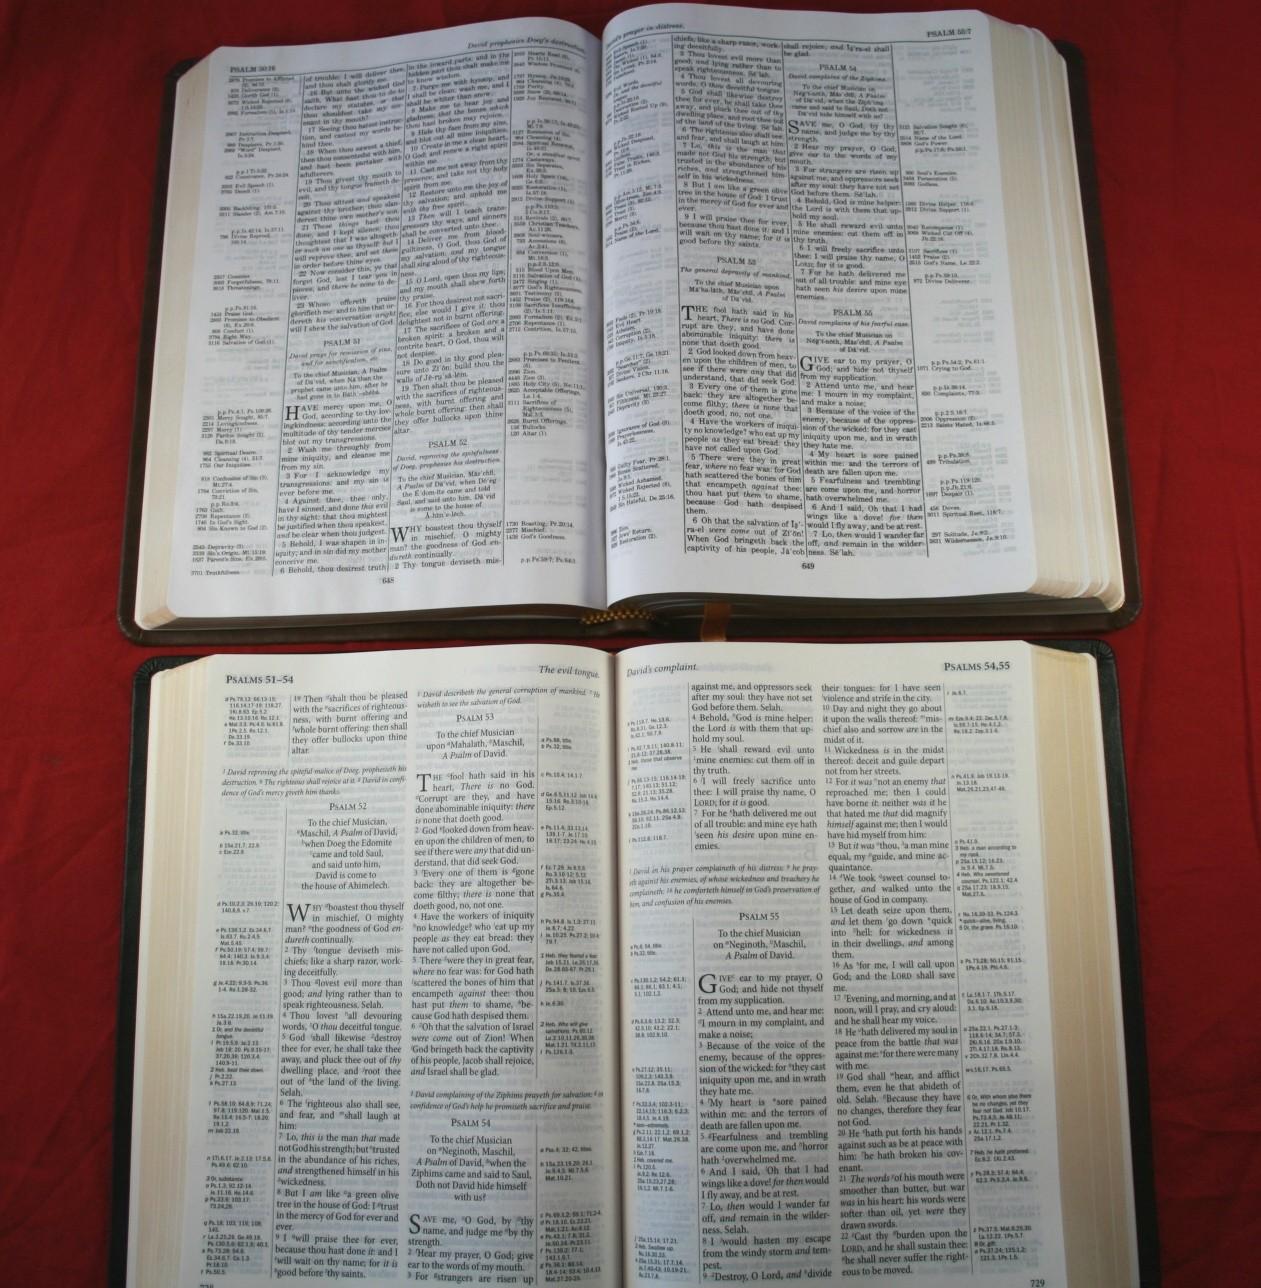 TBS Westminster Reference Bible KJV 033